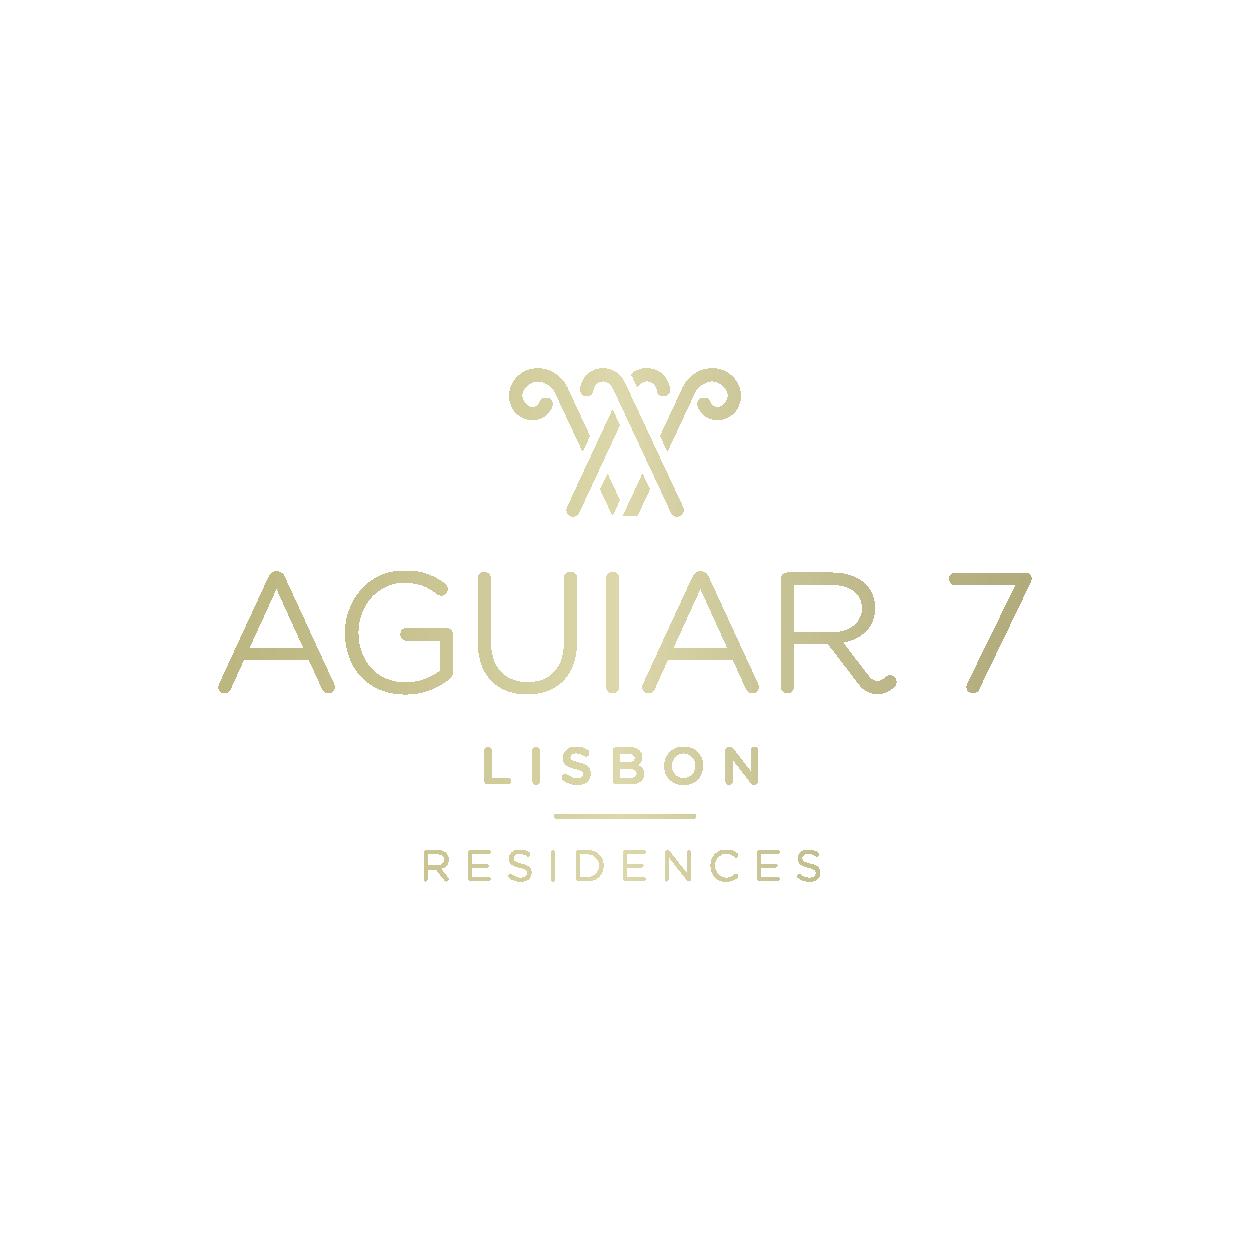 logos para site-05